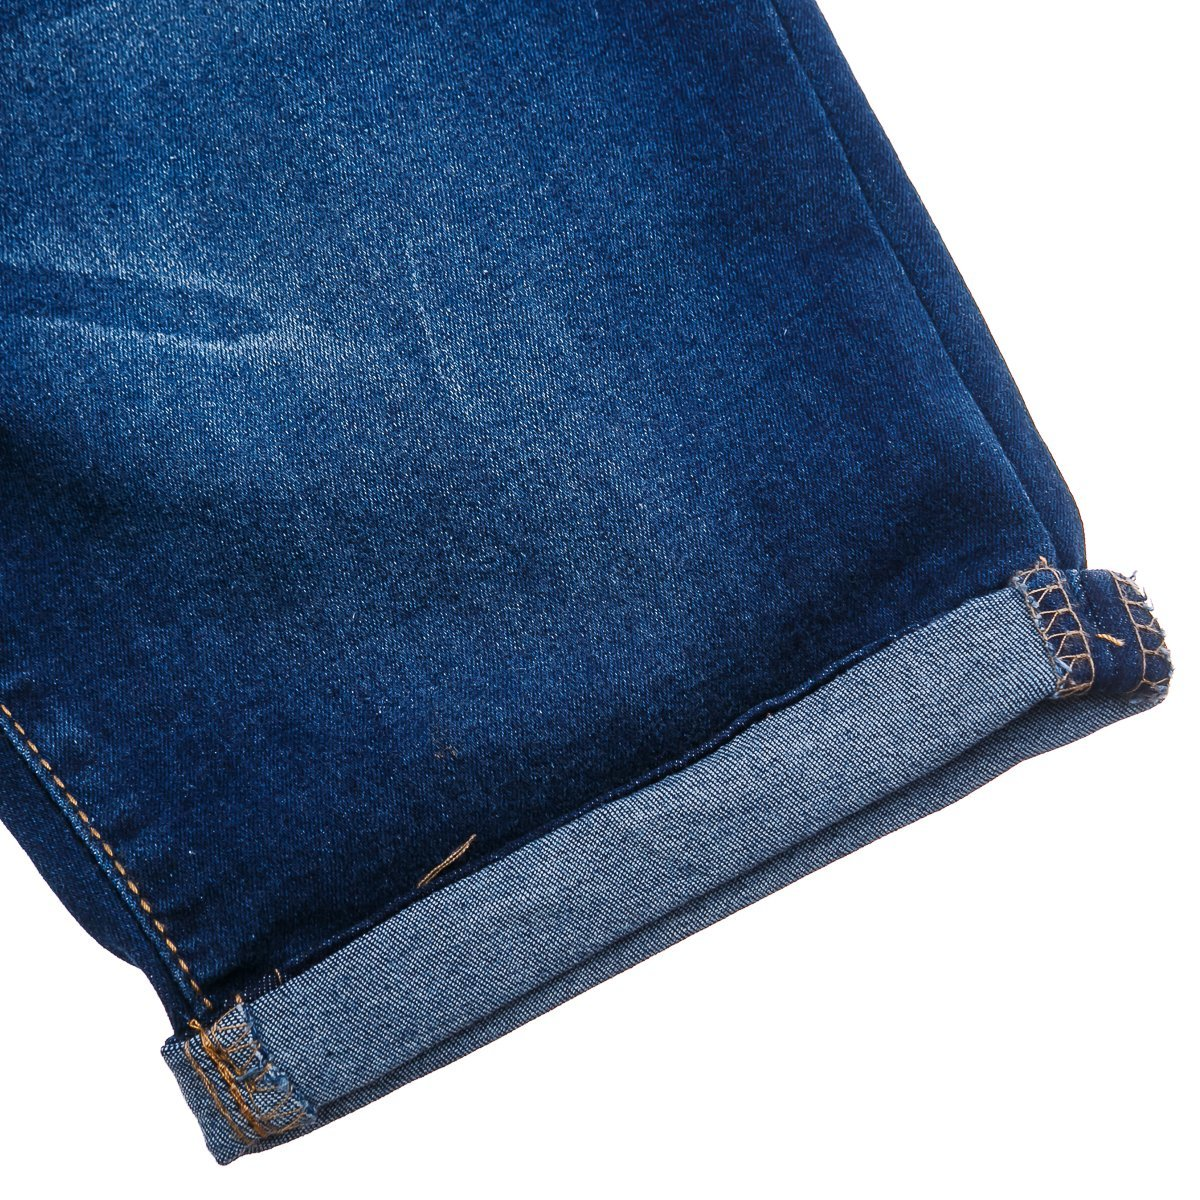 Купить Брюки, джинсы, шорты, Шорты Silversun Navy Jeans, р. 128 SC314384 ТМ: Silversun, синий